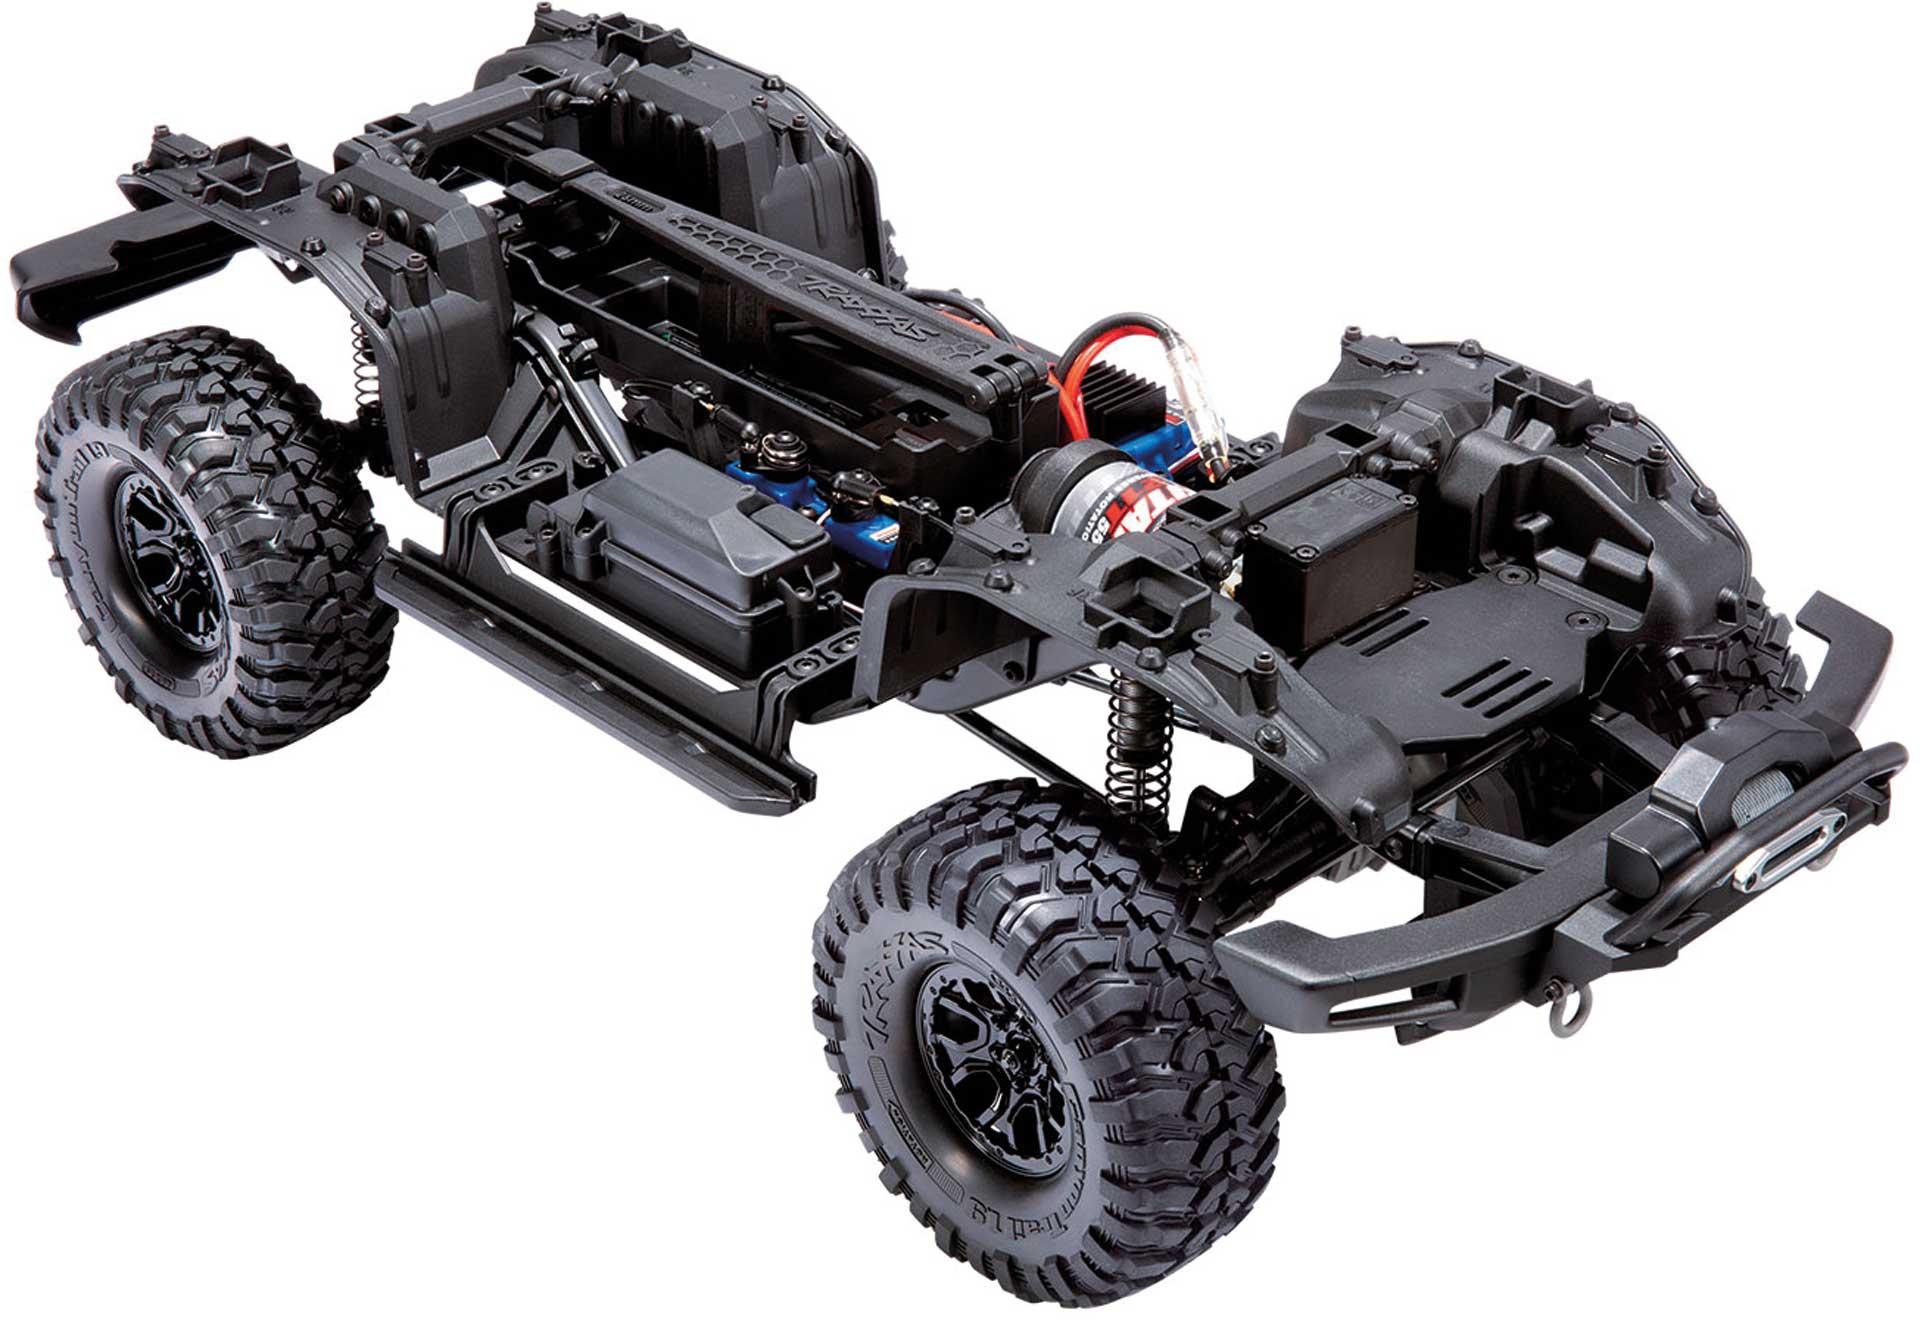 TRAXXAS TRX-4 2021 FORD BRONCO ORANGE RTR O. AKKU/LADER 1/10 4WD SCALE CRAWLER BRUSHED